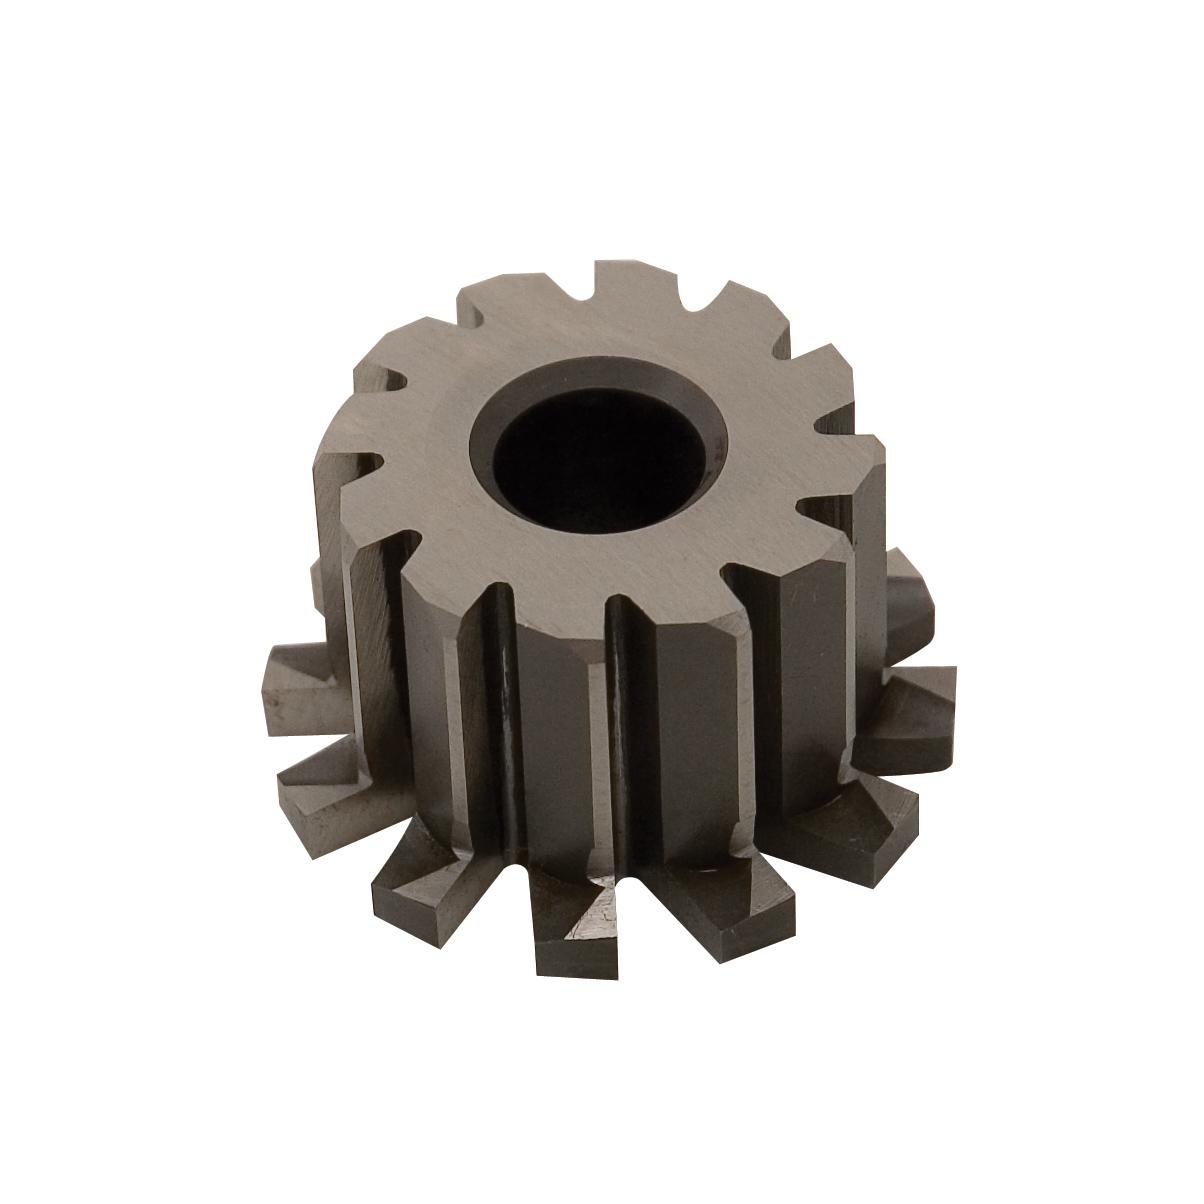 The Park Tool 758 49.57mm Reamer / Facer